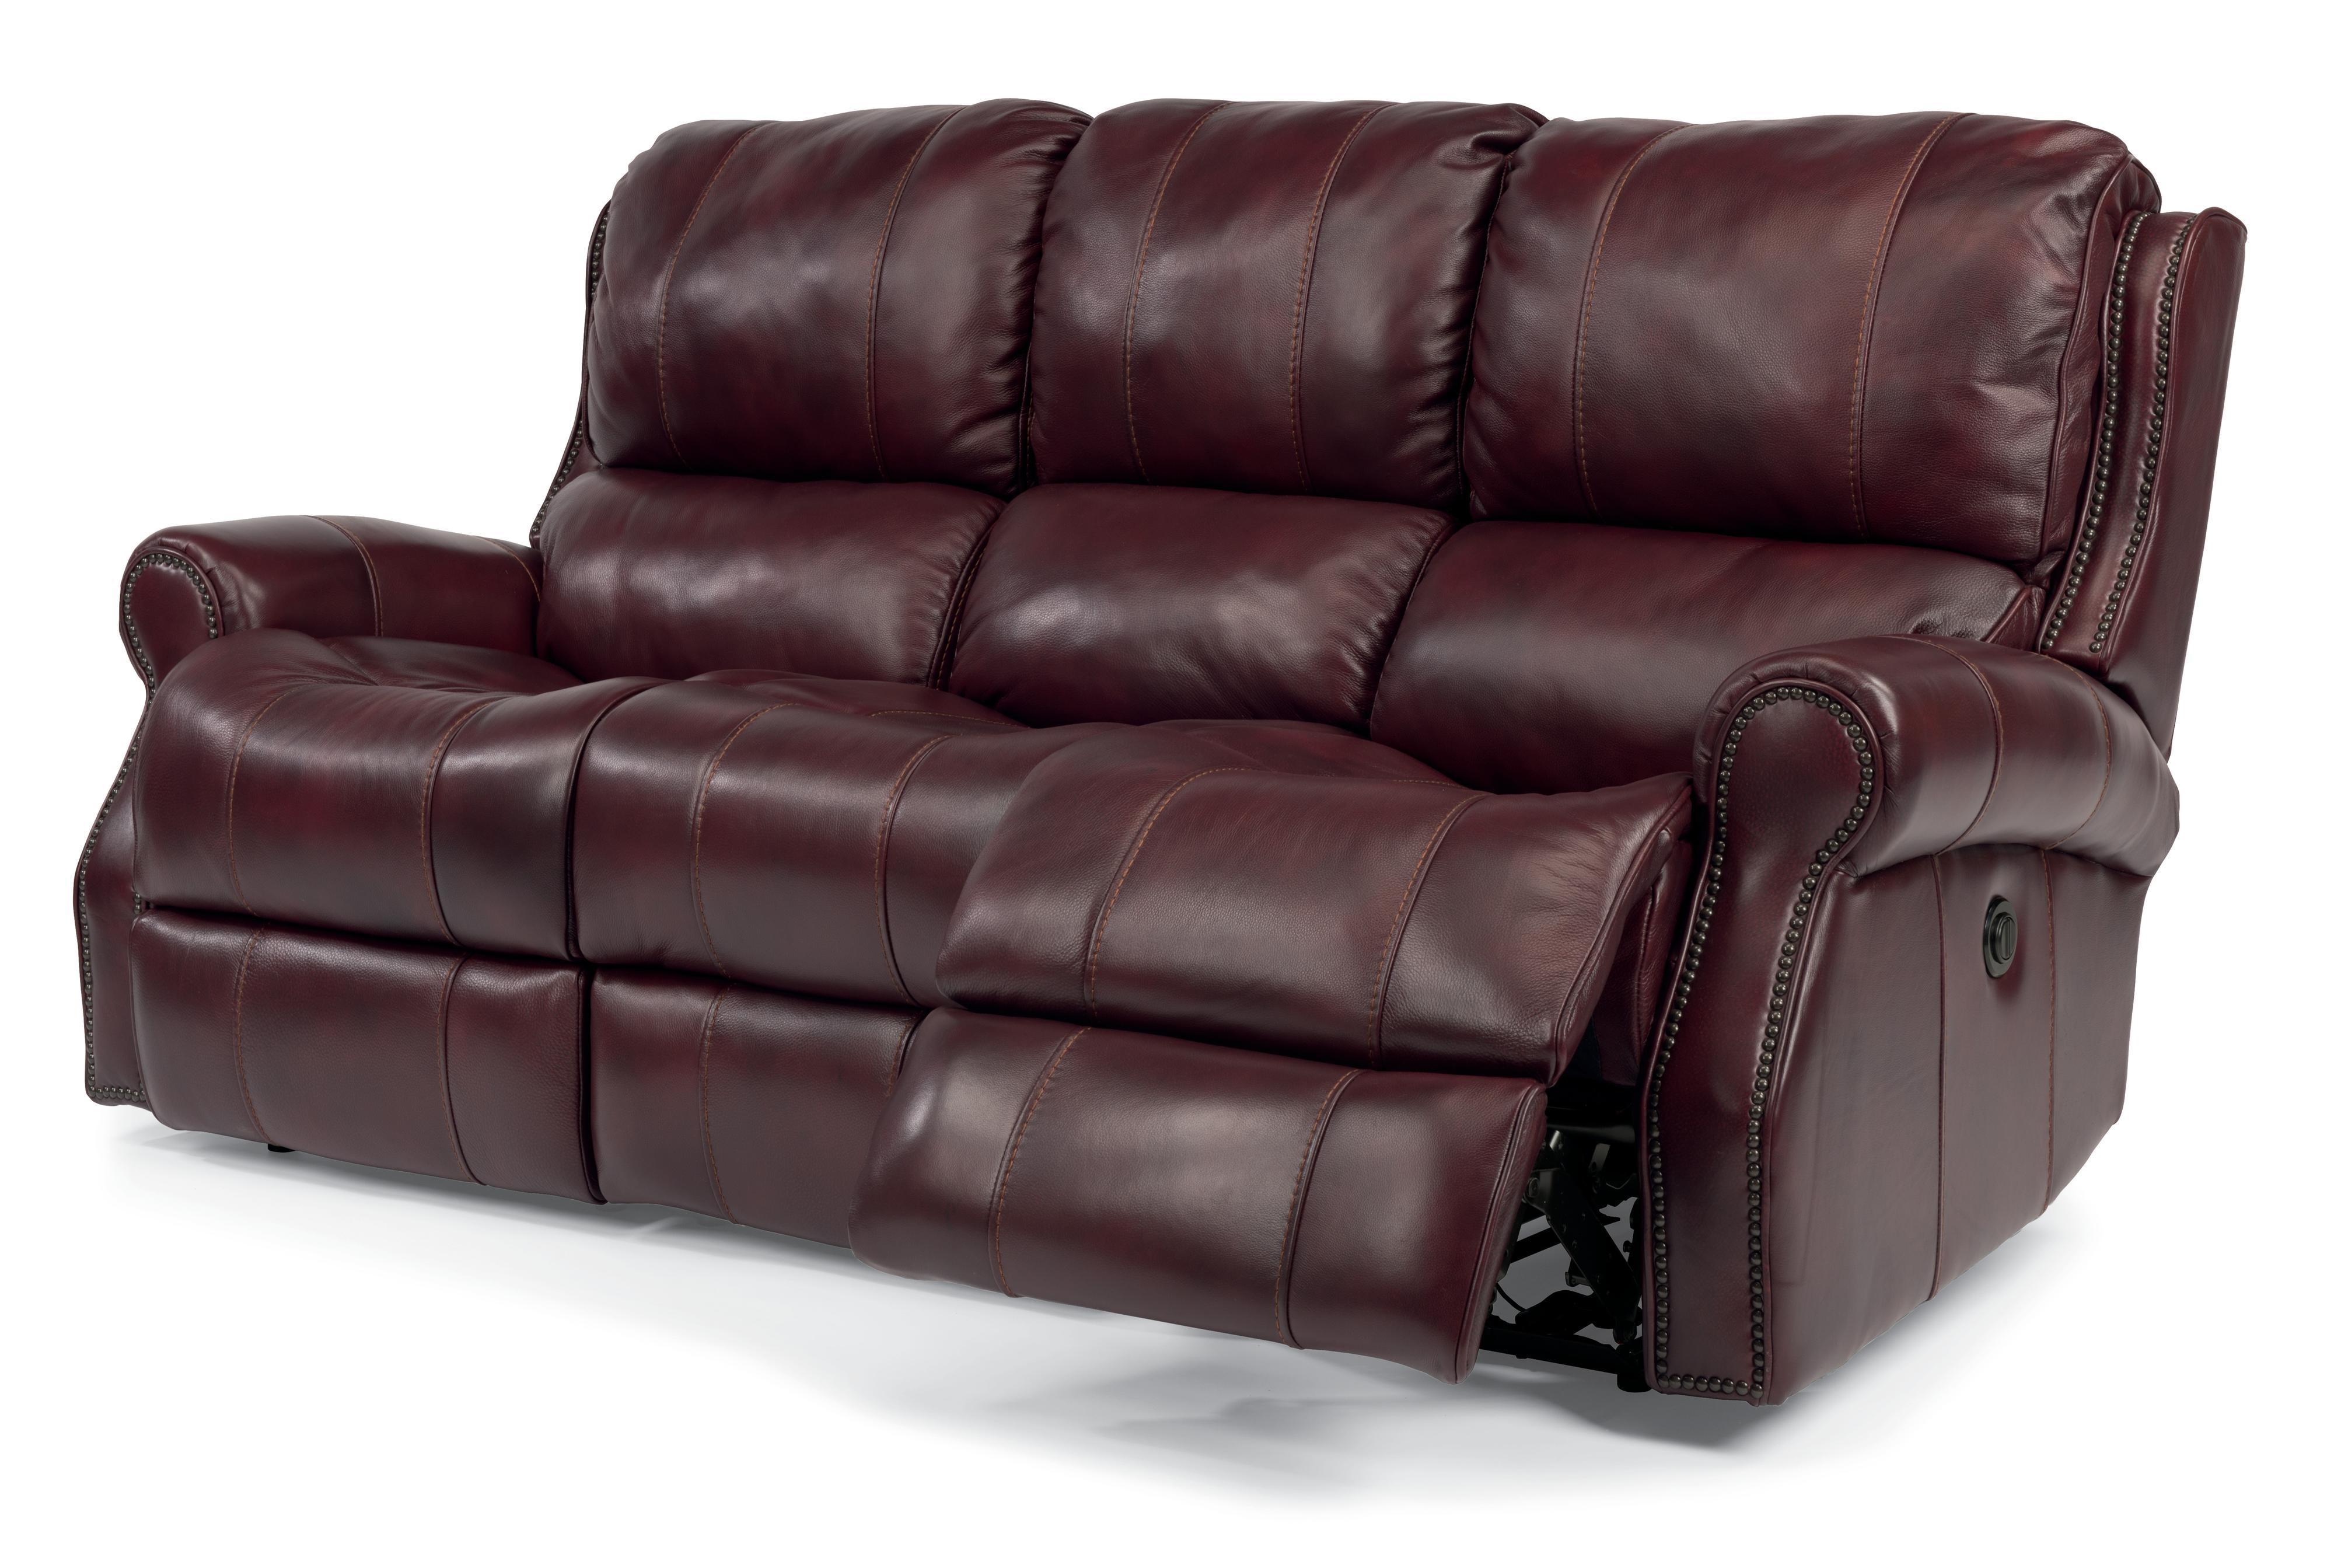 Well Known Berkline Reclining Sofas 54 With Berkline Reclining Sofas For Berkline Sofas (View 18 of 20)